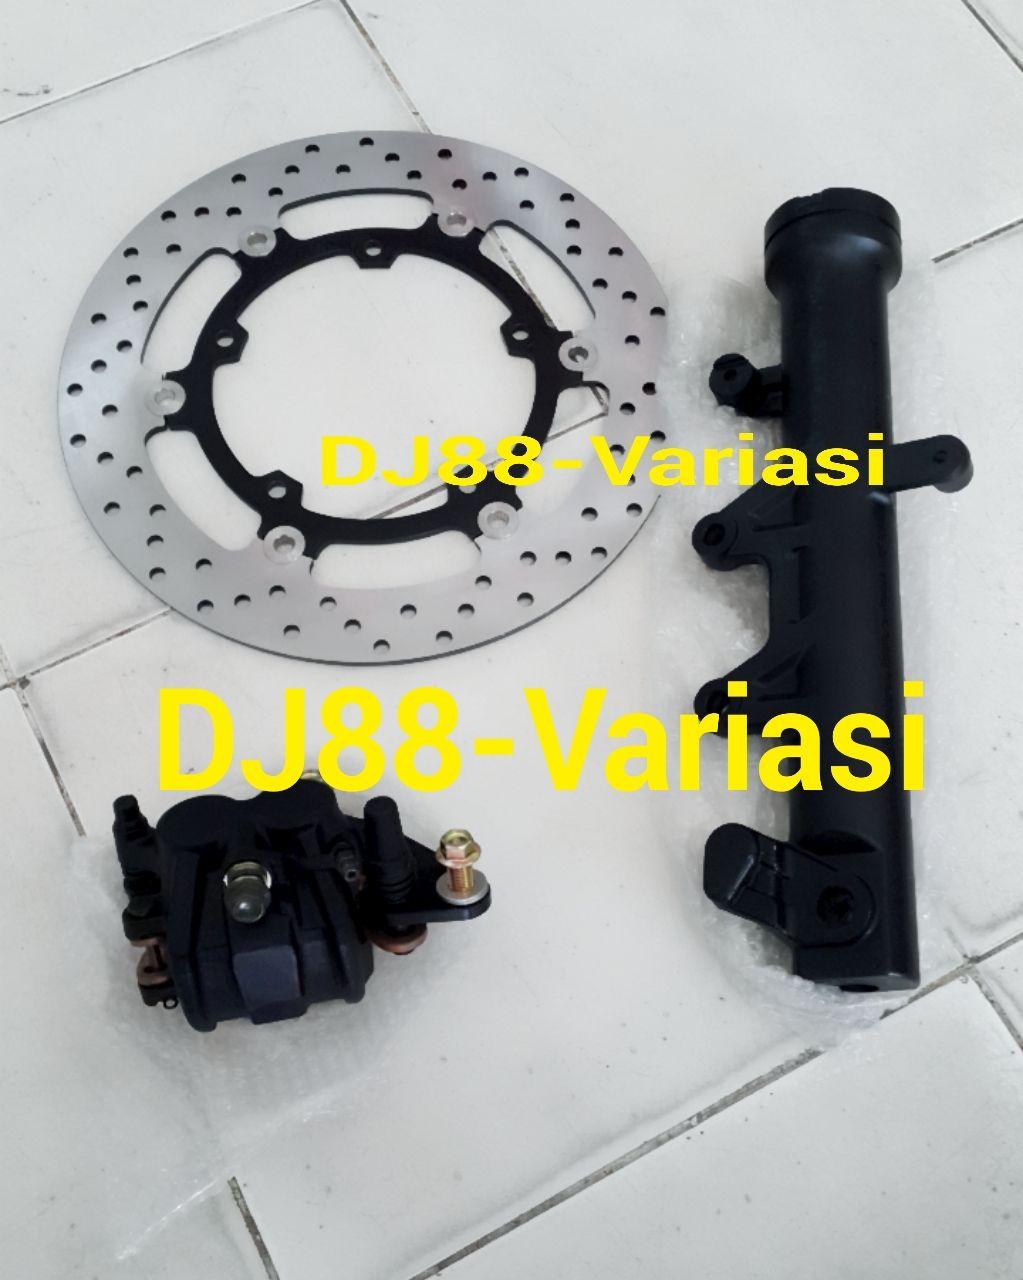 Dj88 Variasi Toko Aksesories Terlengkap Dan Terpercaya Se Indonesia Prospeed Black Series Yamaha R25 Mt 25 Slip On Paket Double Disc Tabung Shock Kiri Kaliper Cak